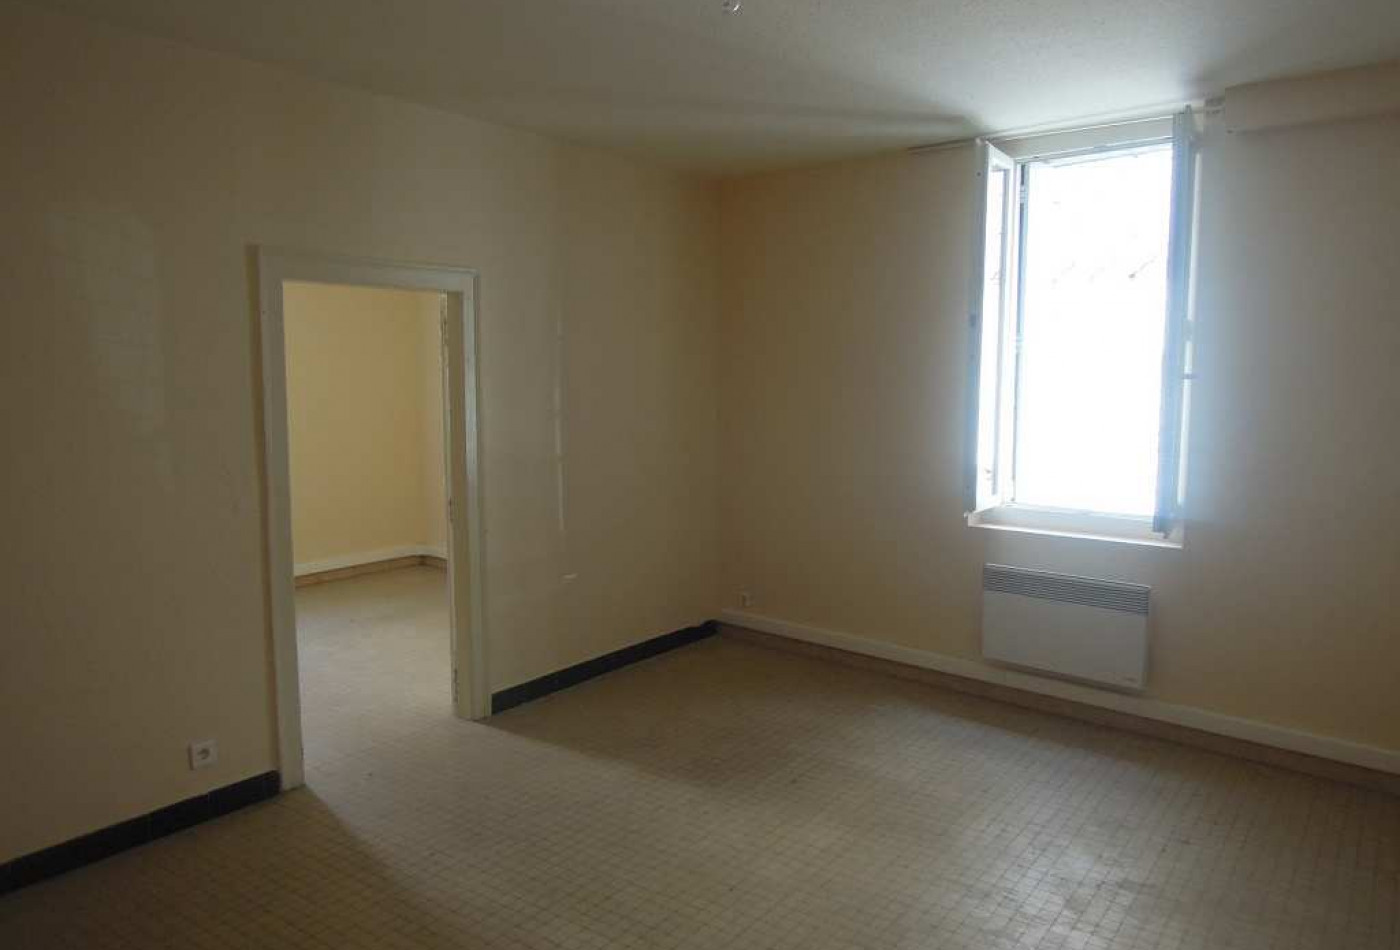 appartement en location montpellier r f 341681047 frances immobilier. Black Bedroom Furniture Sets. Home Design Ideas